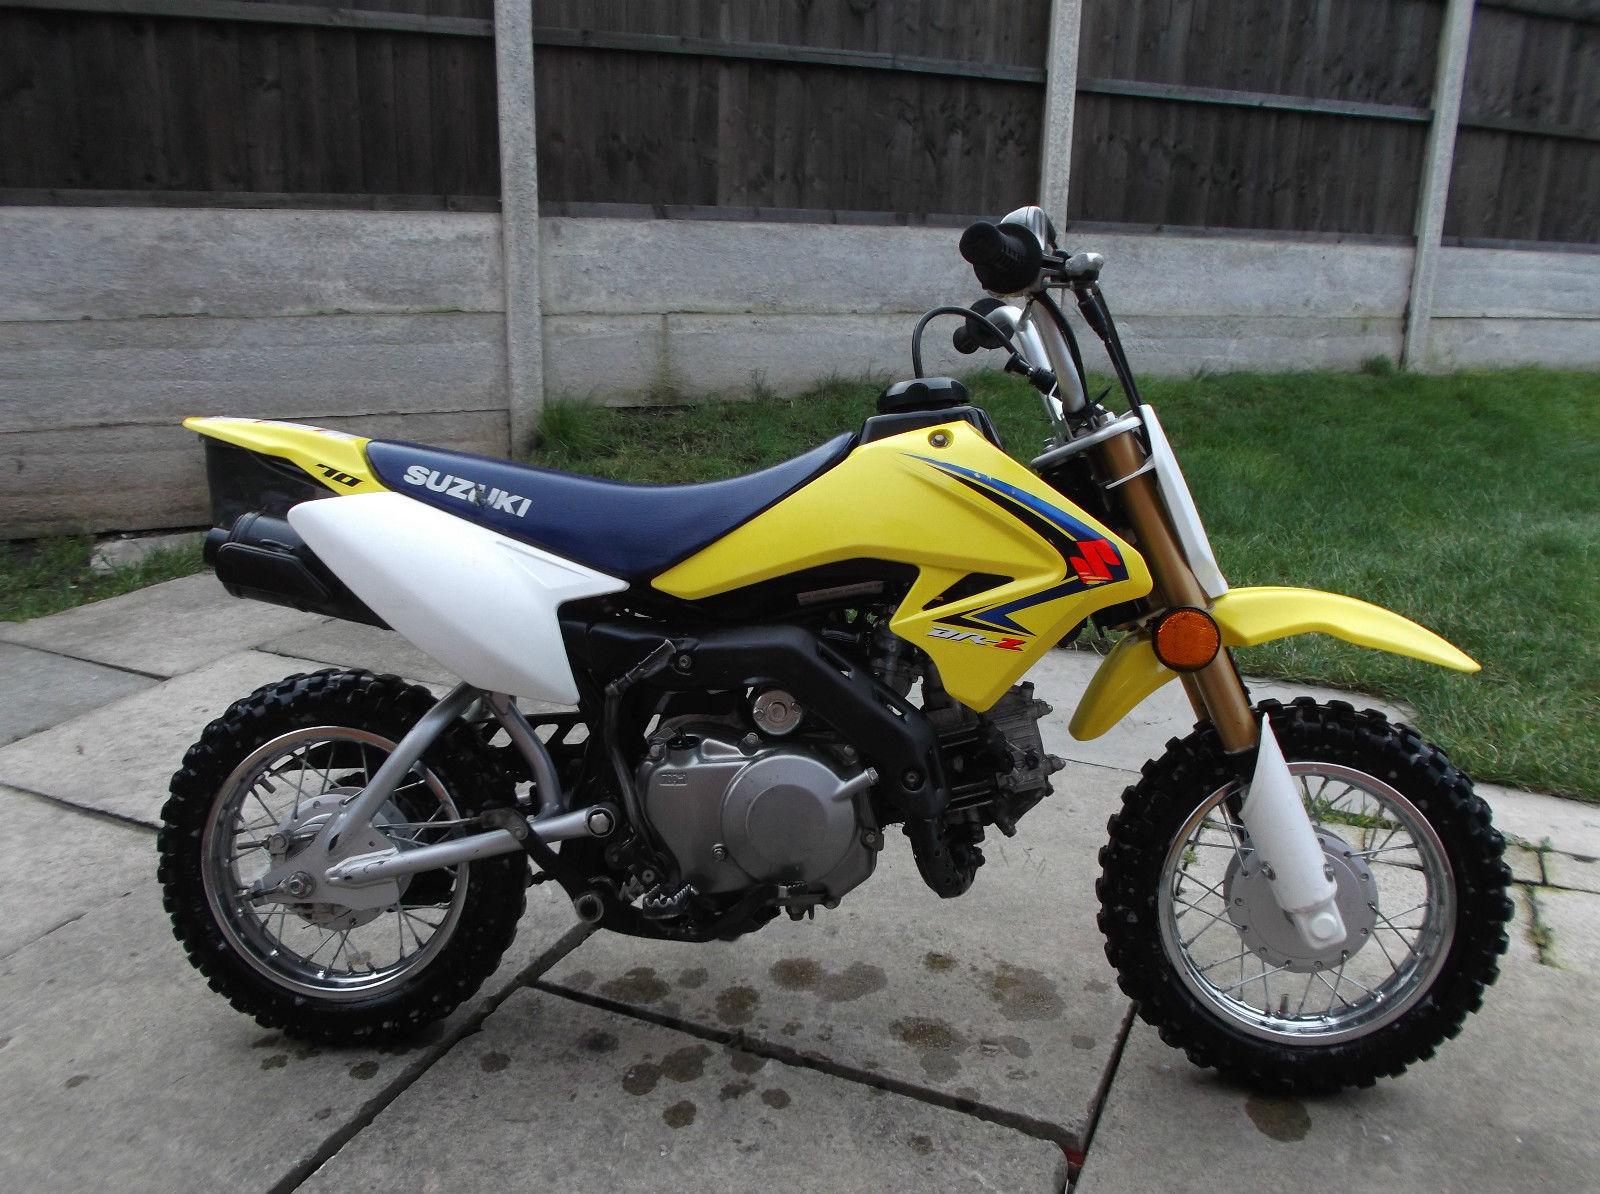 drz 70 very good condition sameas crf50 ttr 50 xr50 pw50 jr50 jr80 kid mini bike